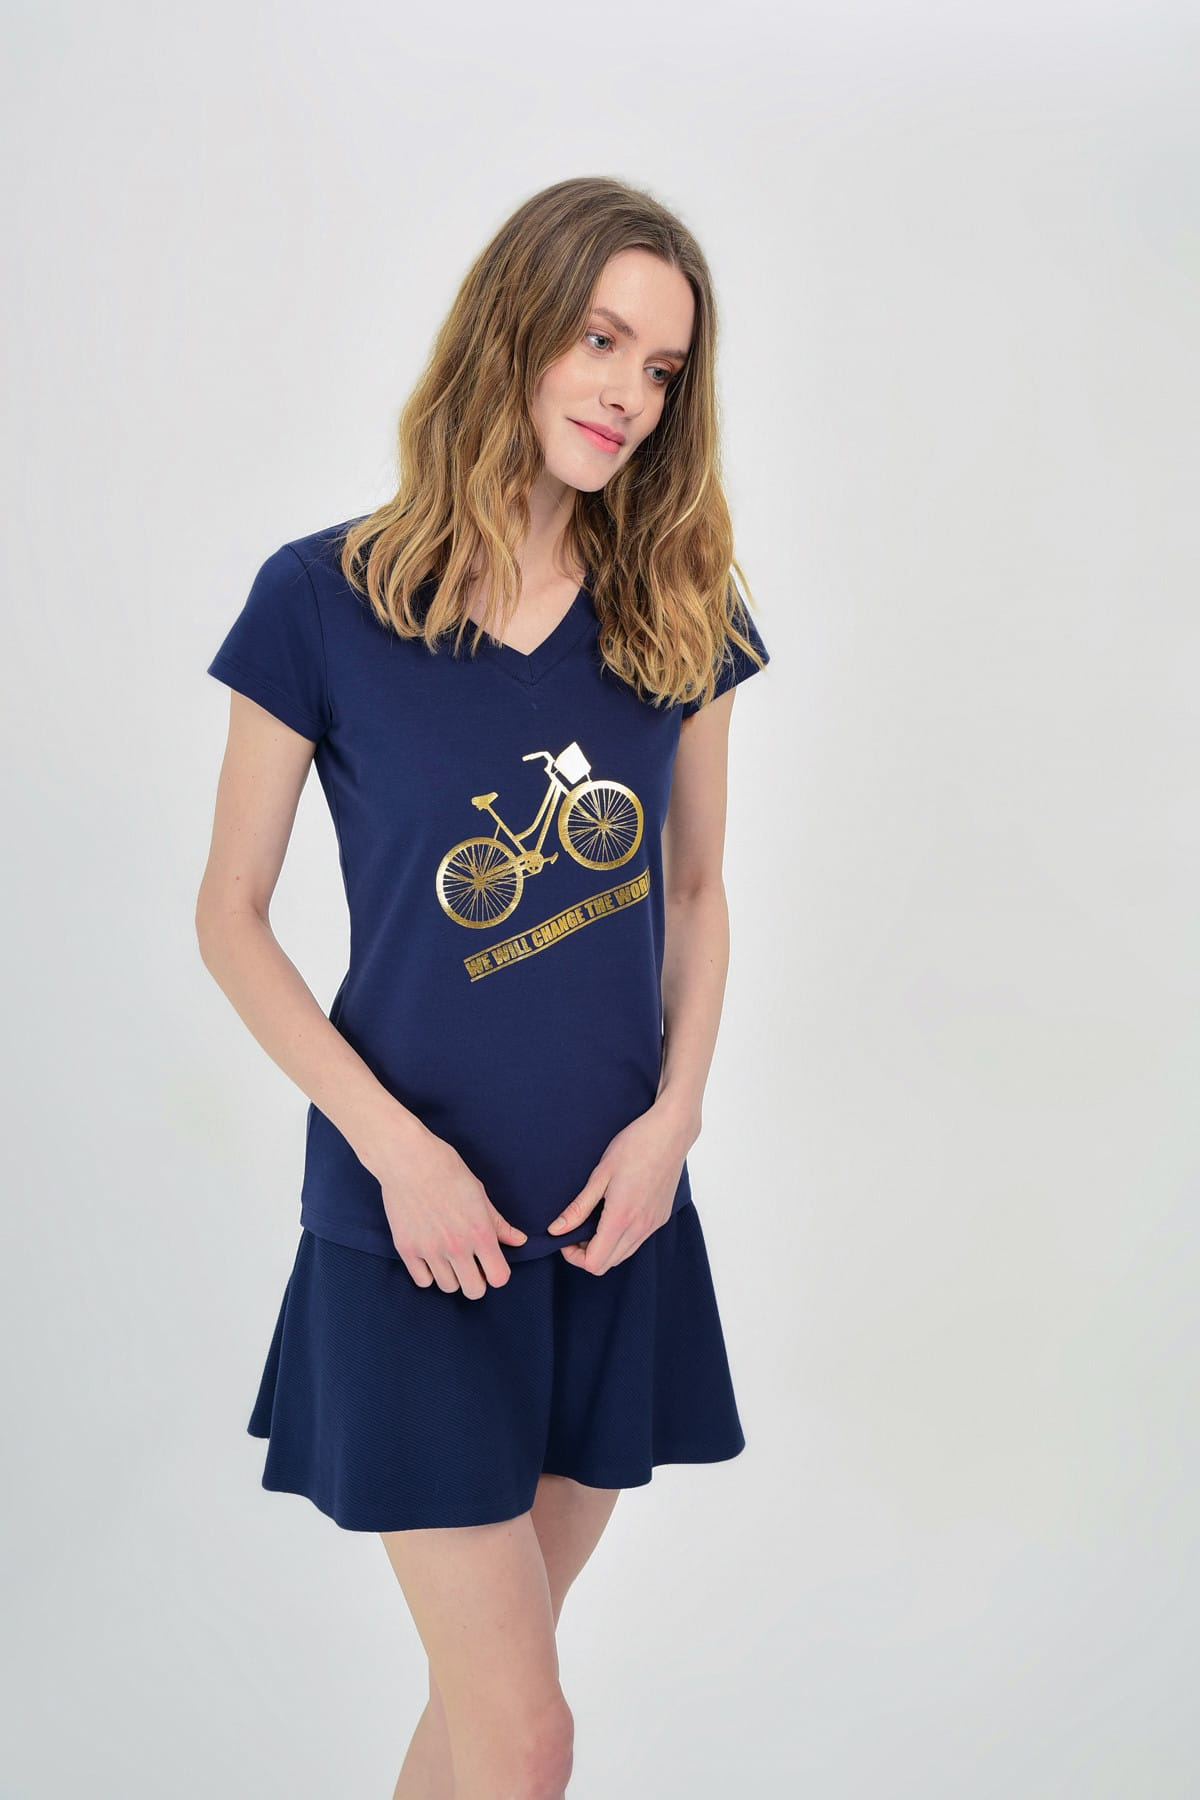 Hanna's by Hanna Darsa Kadın Lacivert Bisiklet Baskılı T-Shirt Hn1308 1